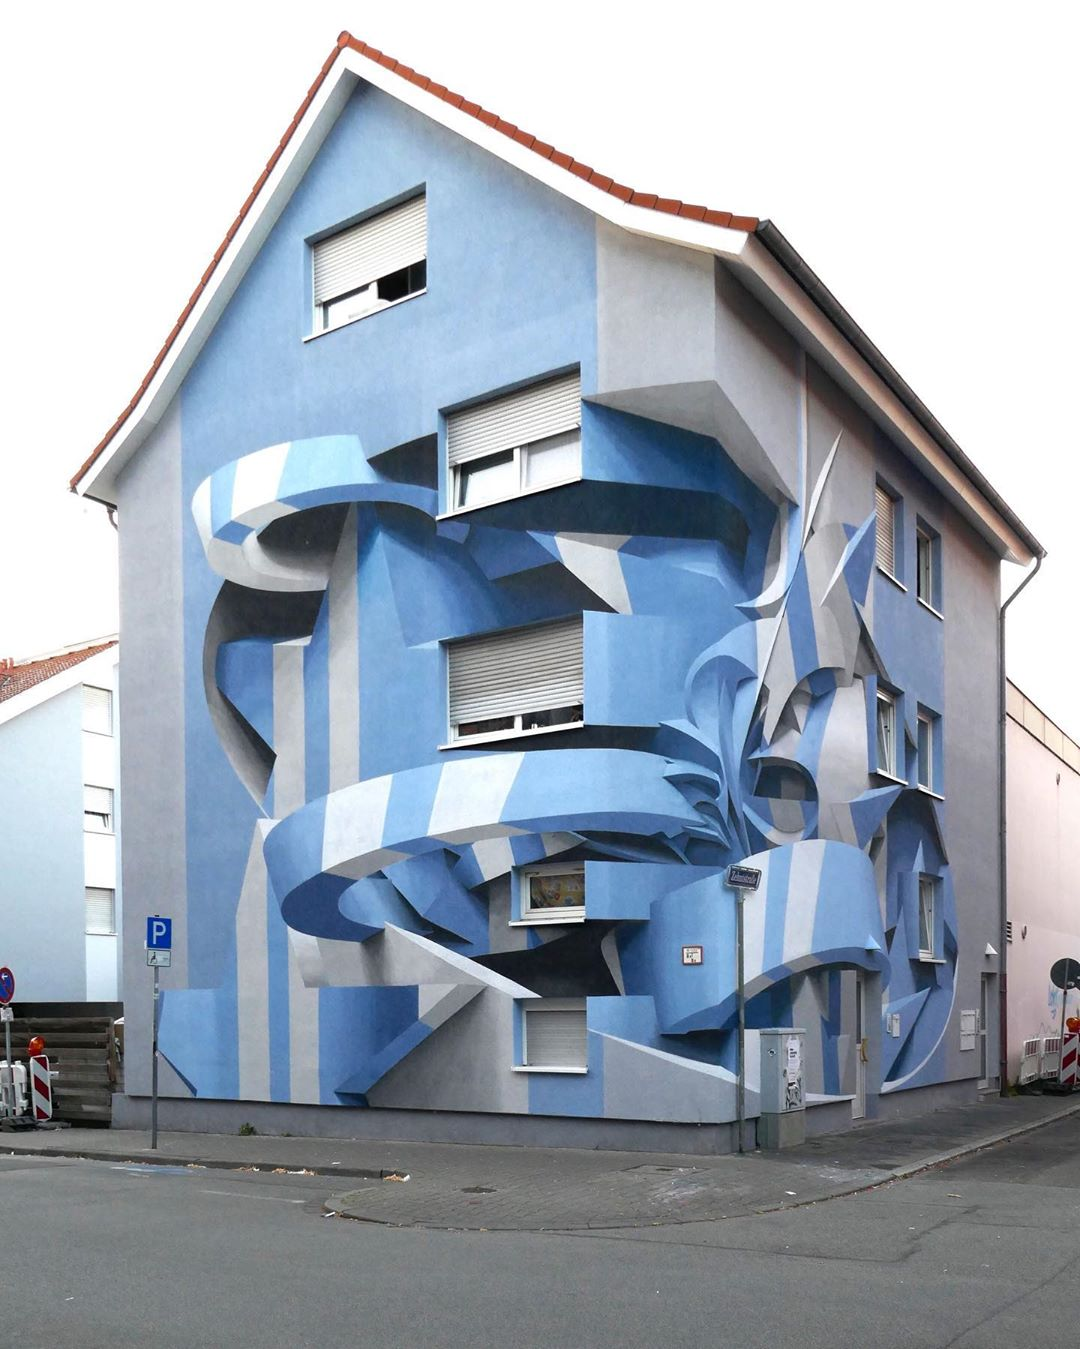 Peeta | Mural | Mannheim, Germany | 2019